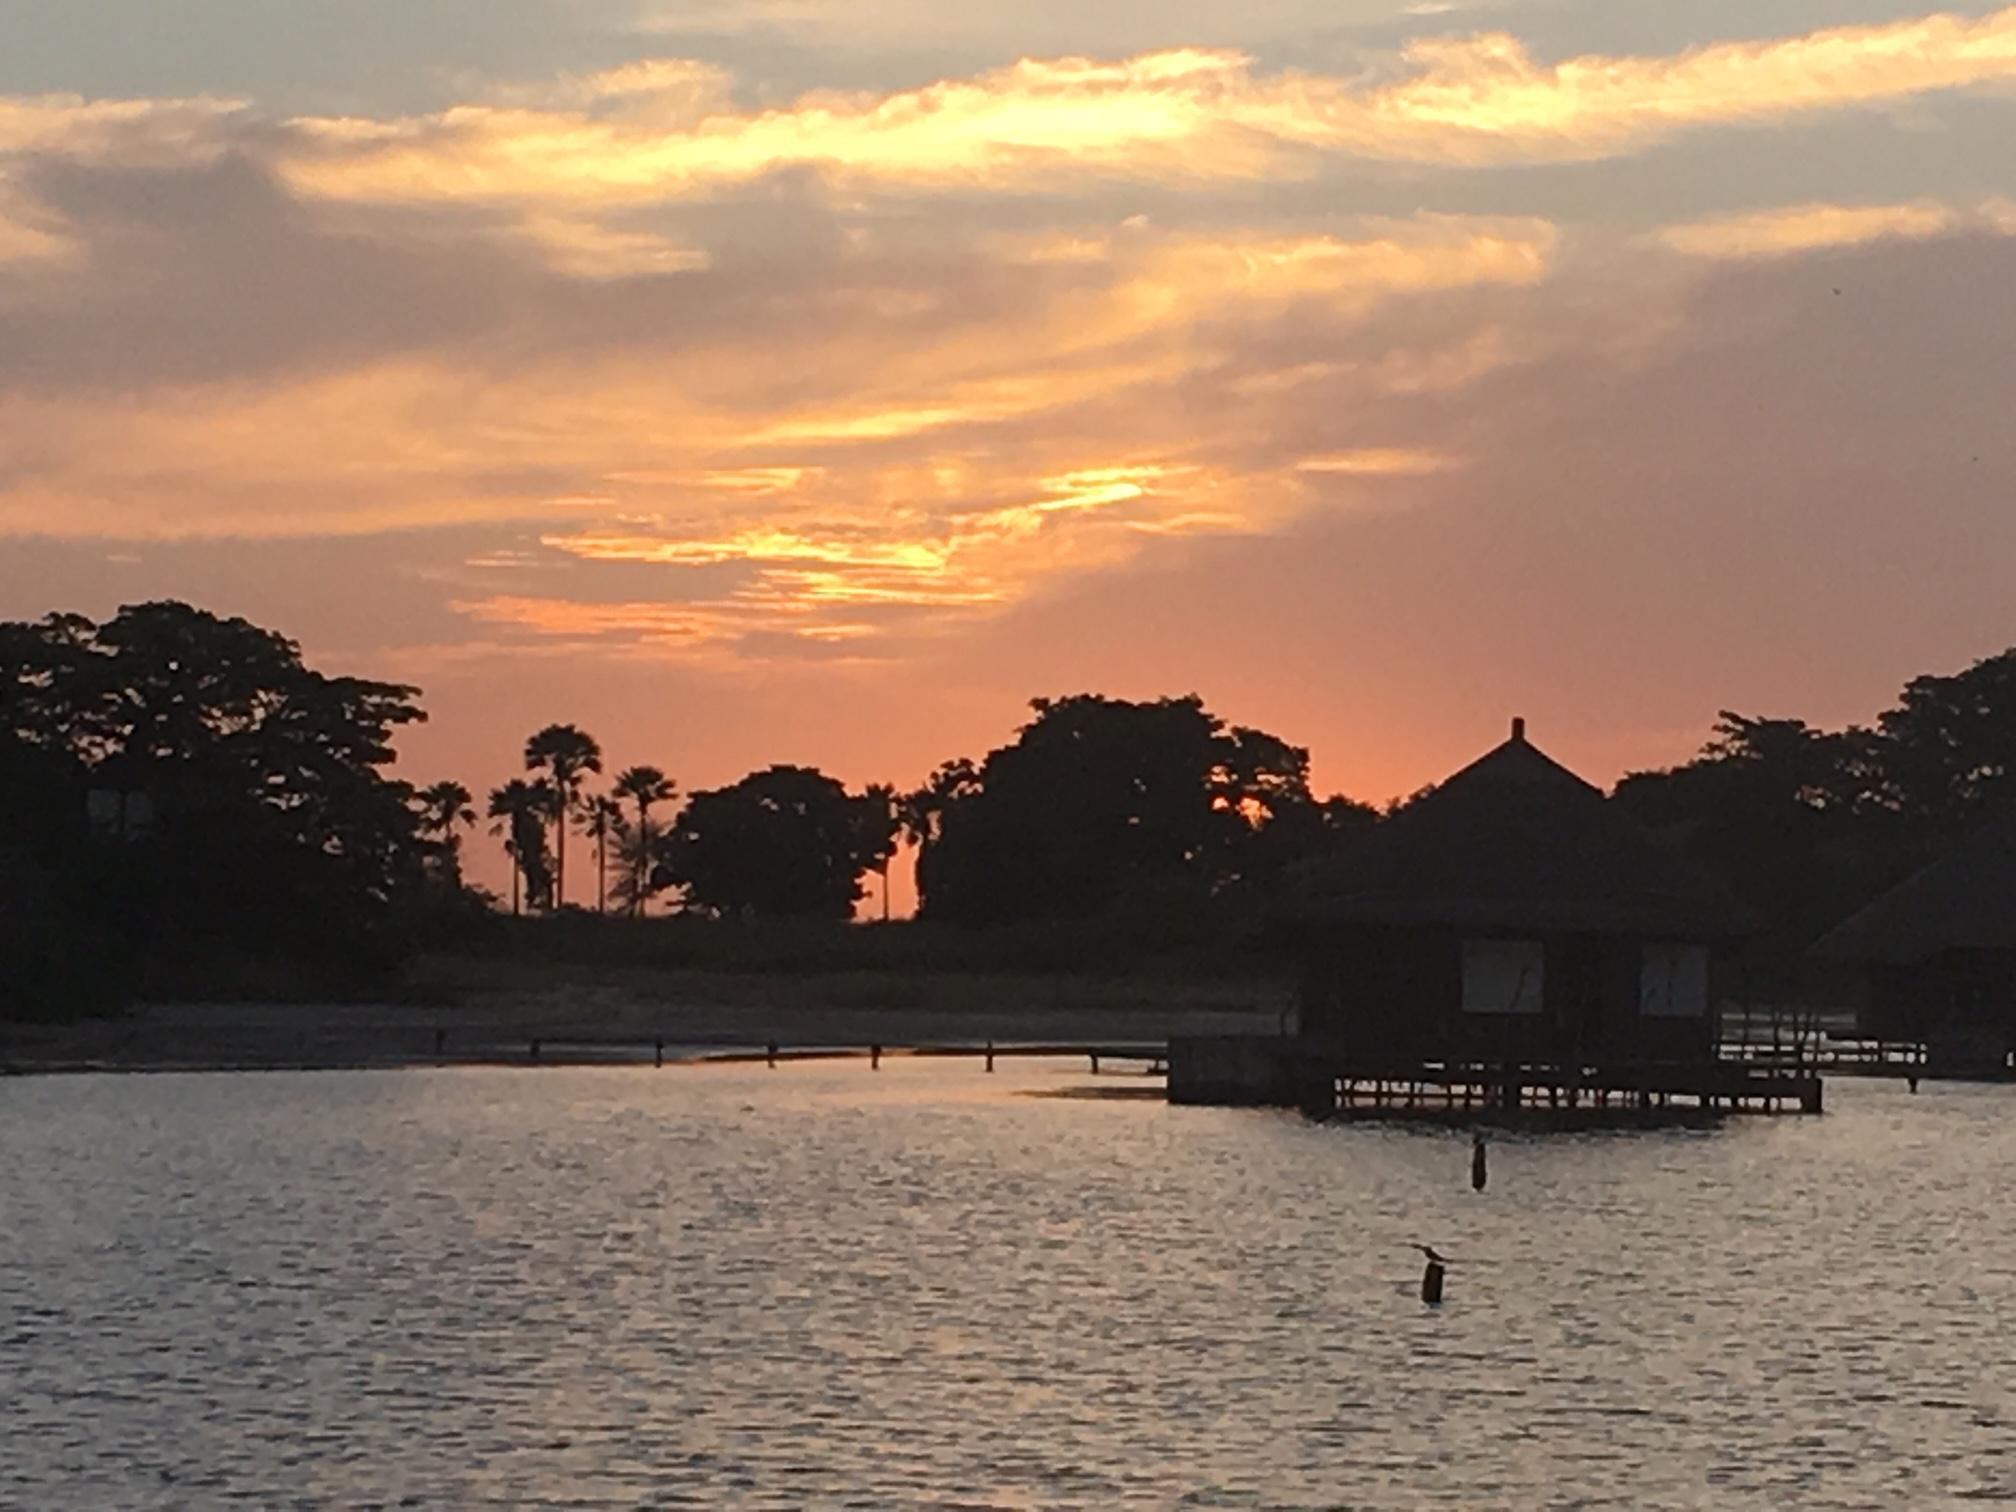 Such a beautiful sunset...